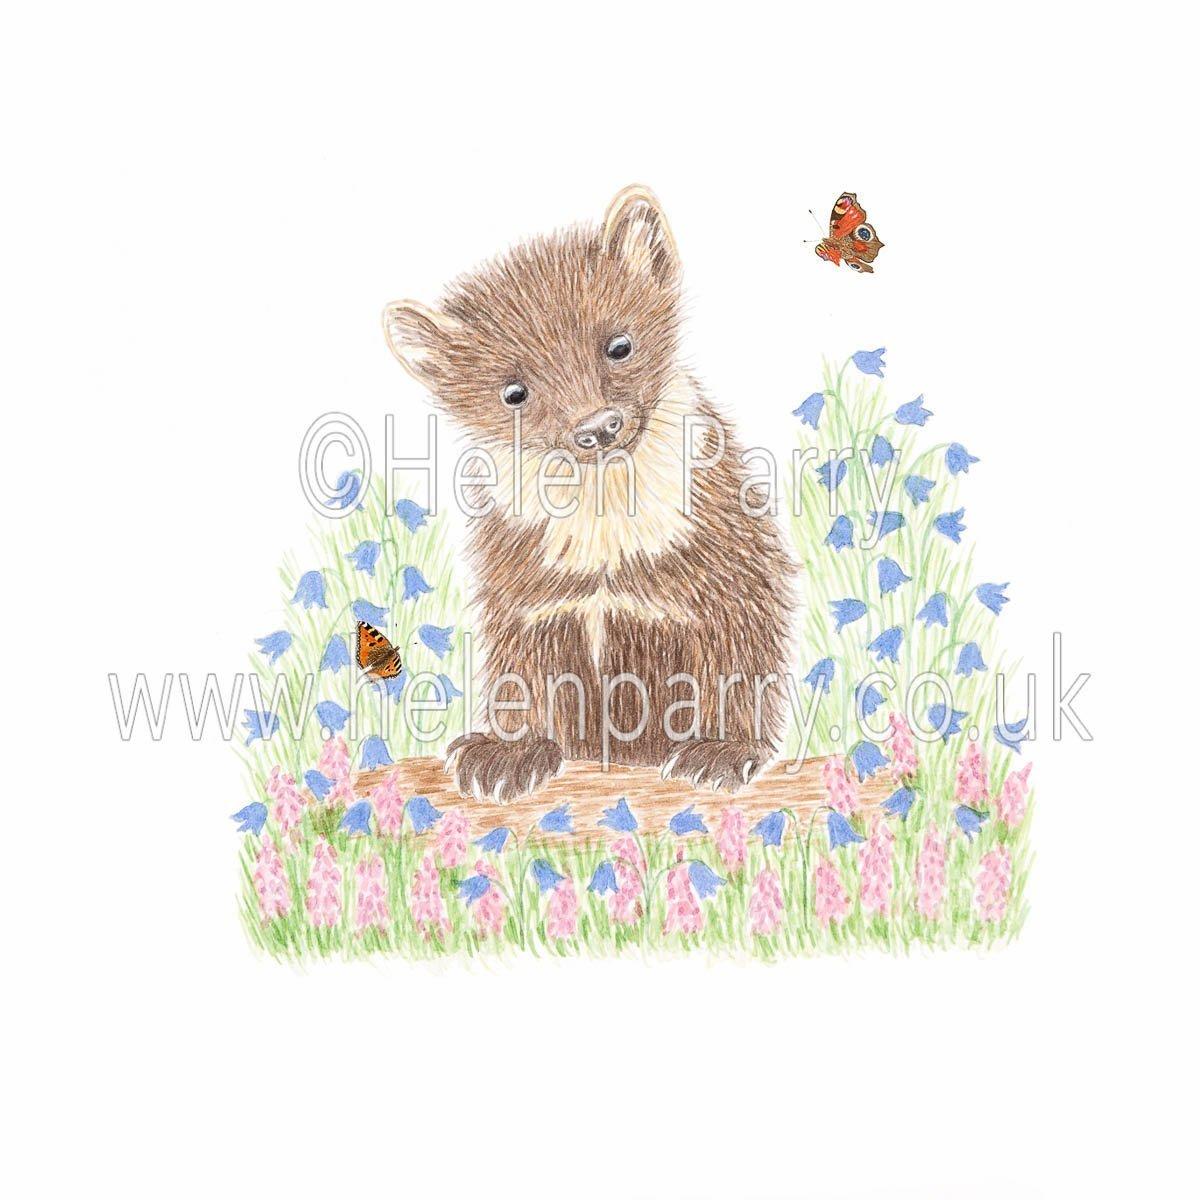 greeting card of fun loving pine marten amongst harebells